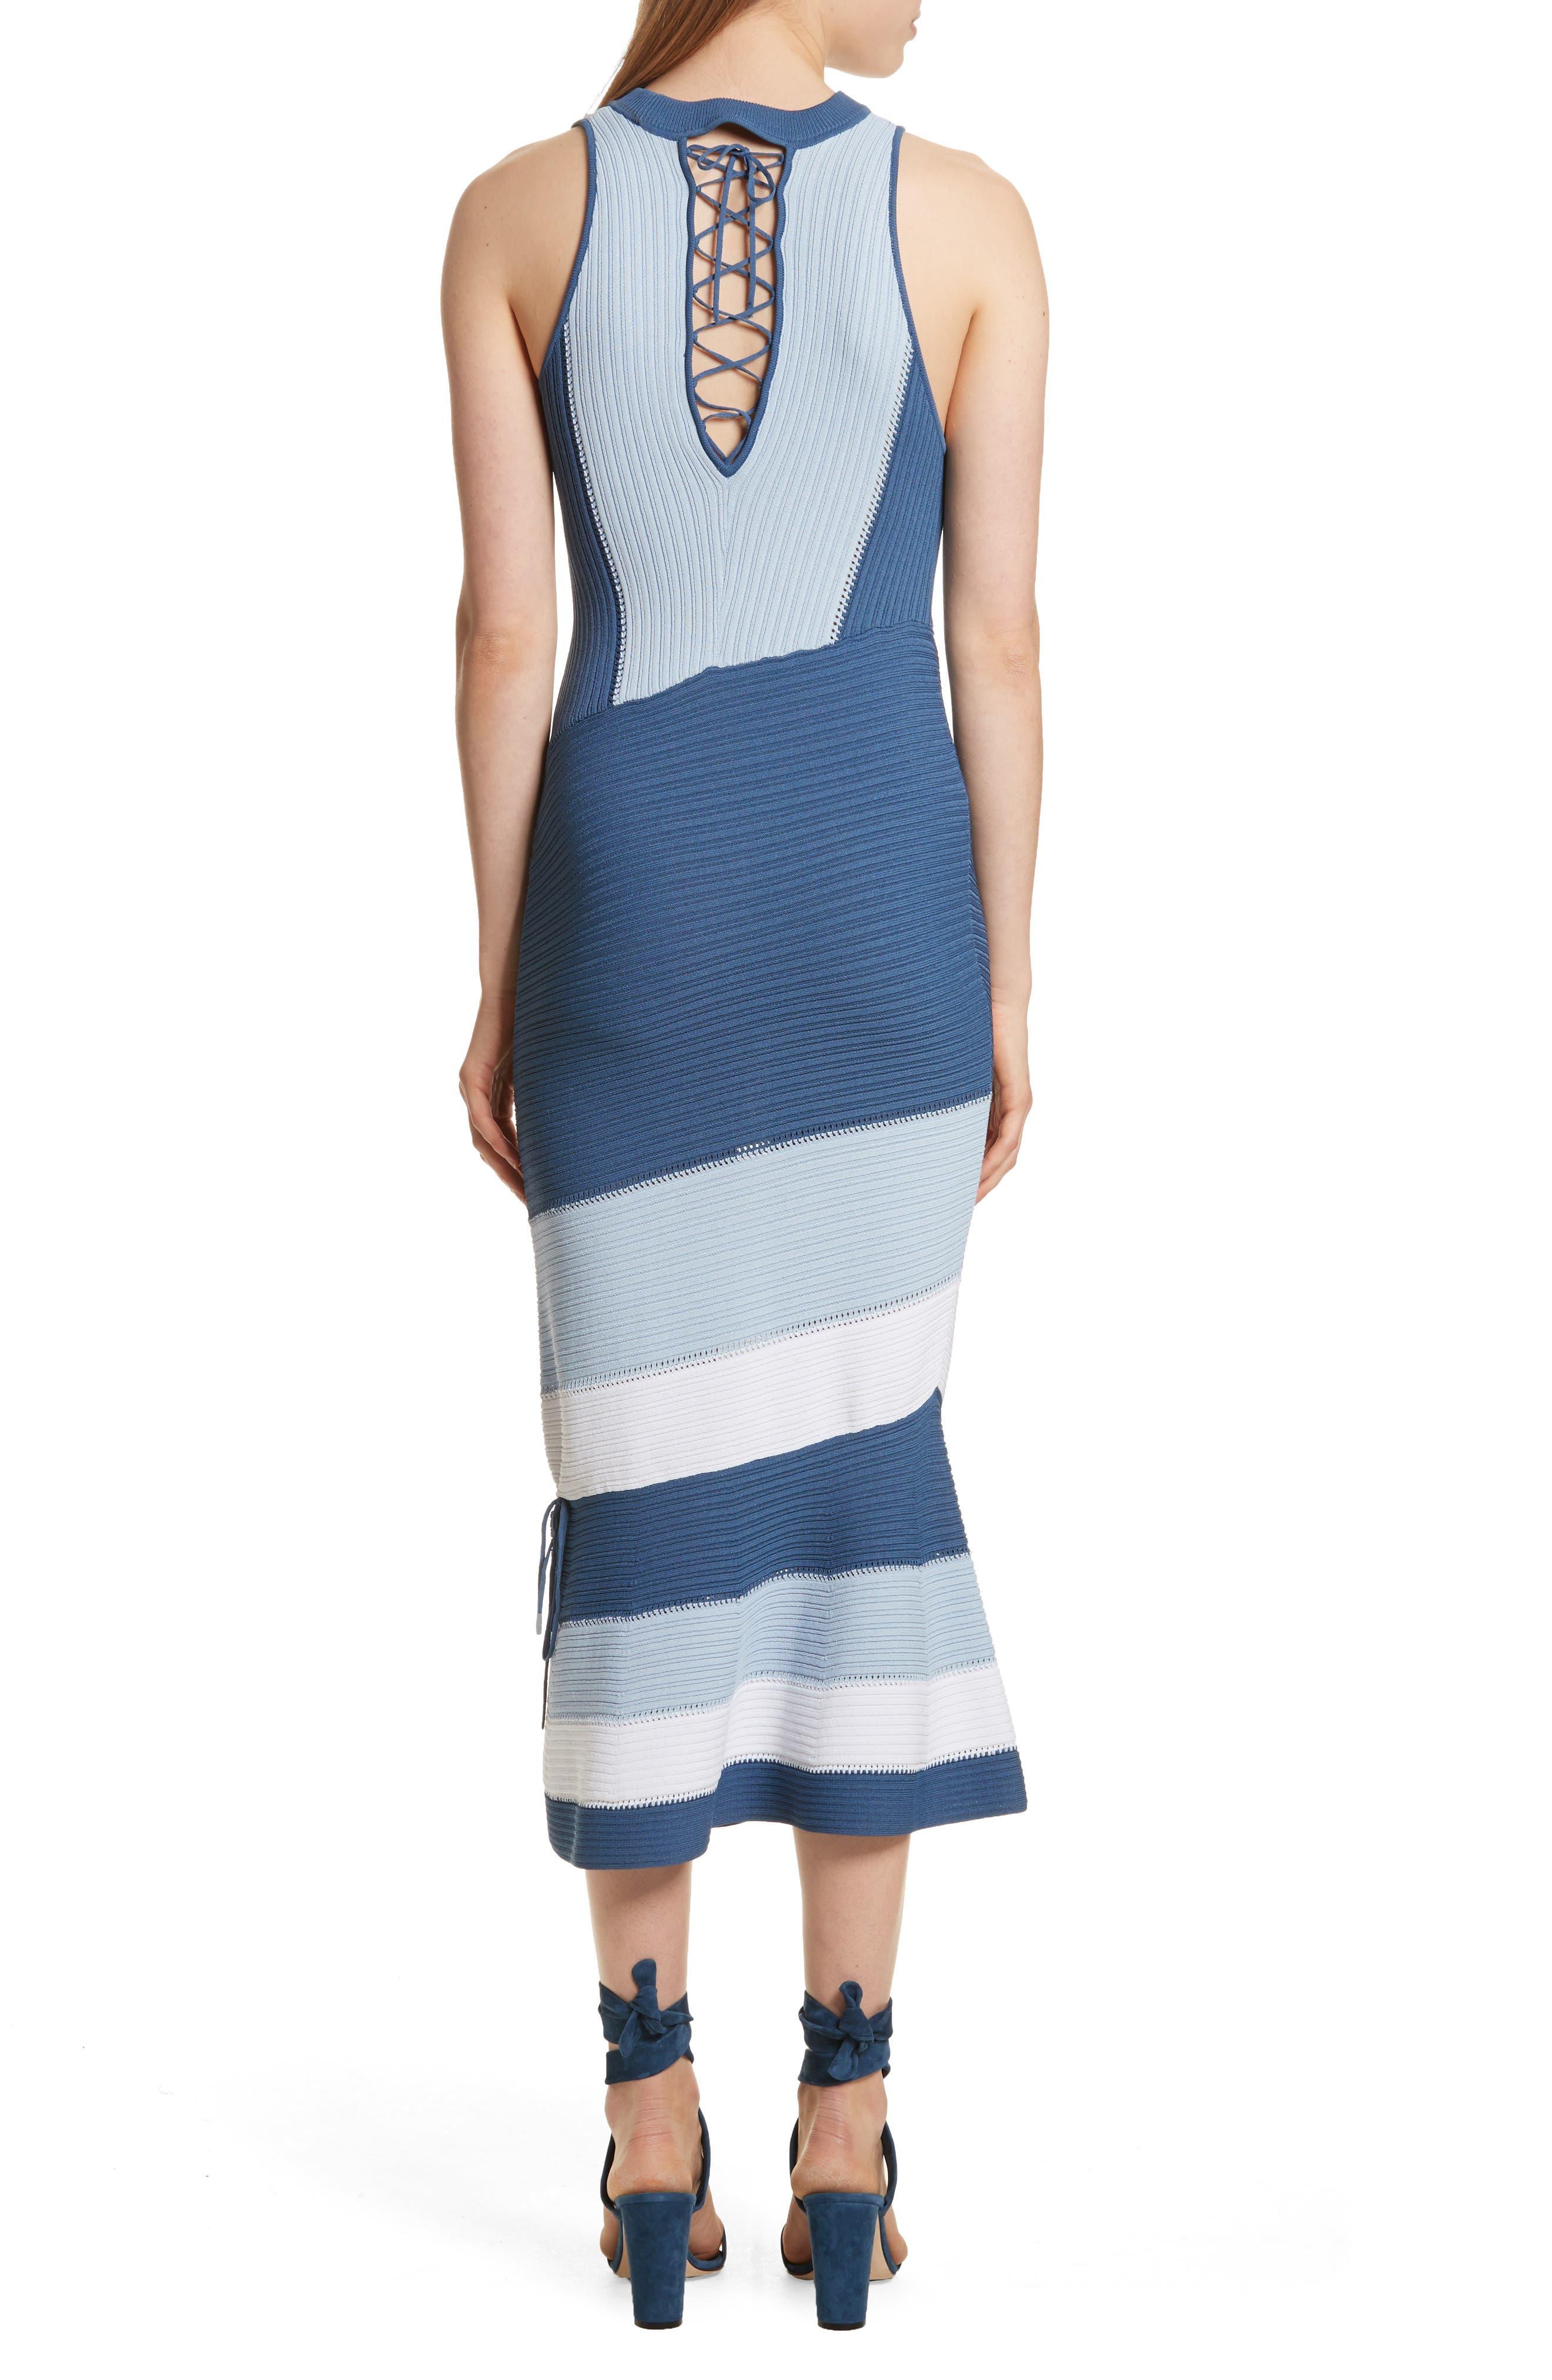 Linked Asymmetrical Dress,                             Alternate thumbnail 2, color,                             Blue Combo